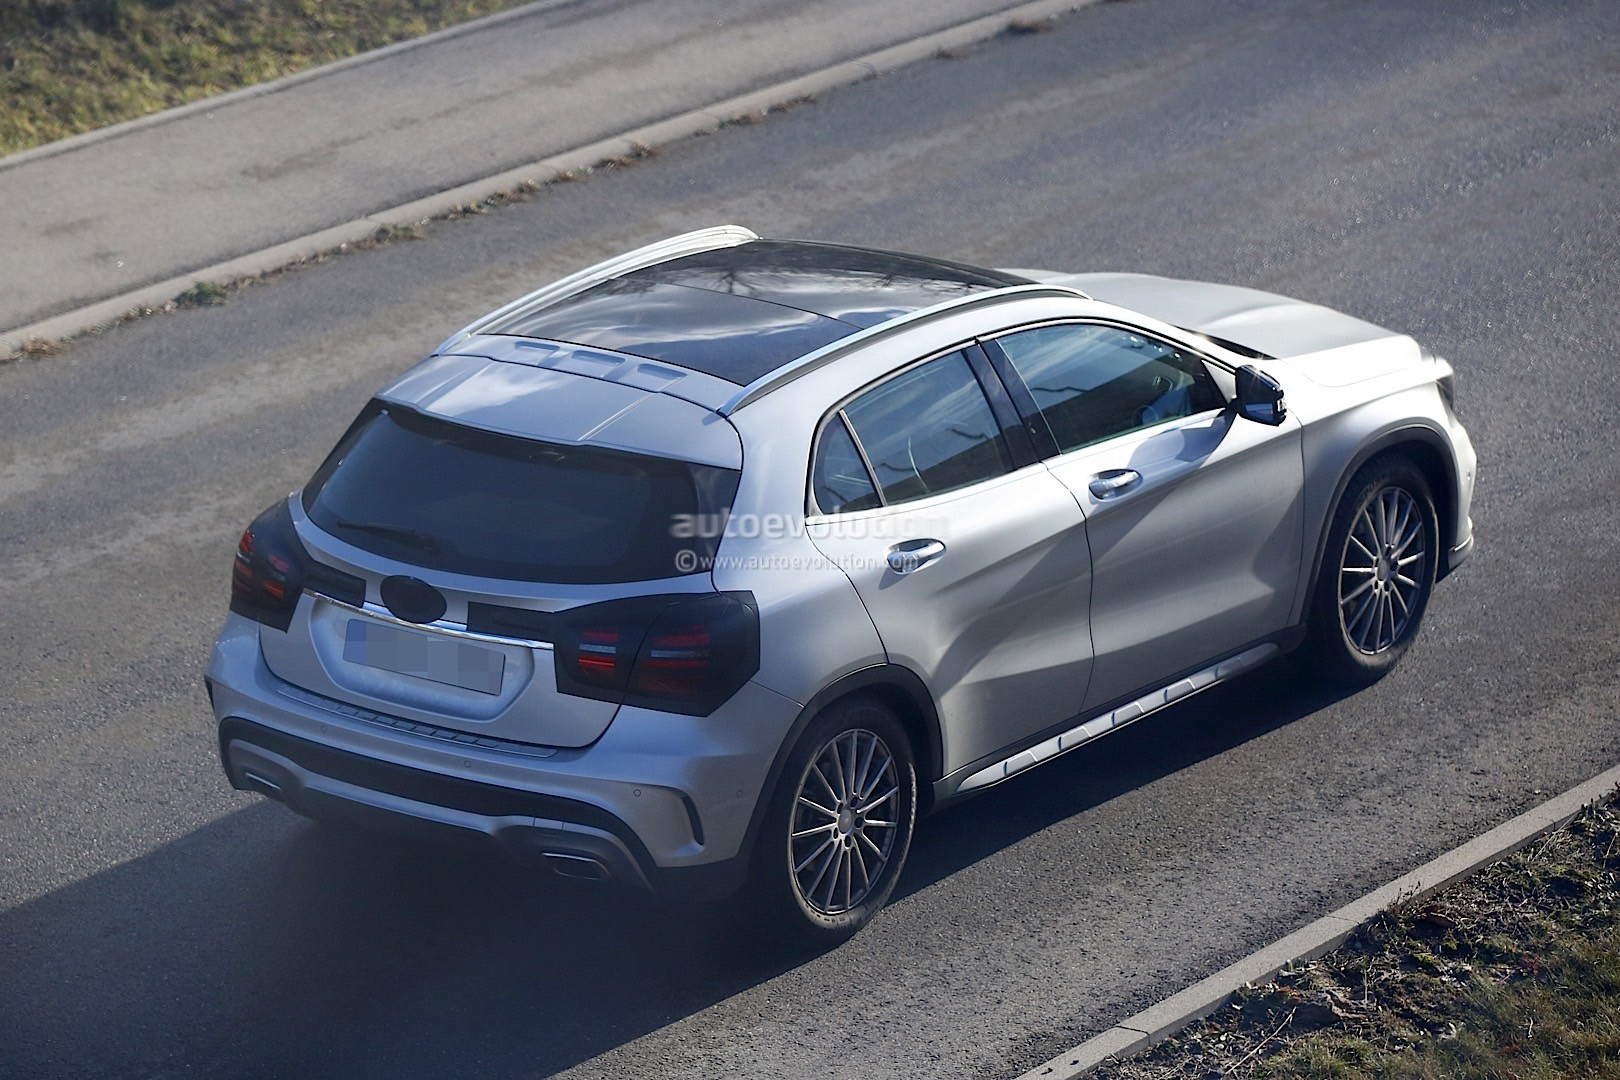 2017 Mercedes Benz Gla Facelift Spied With Minimum Camo